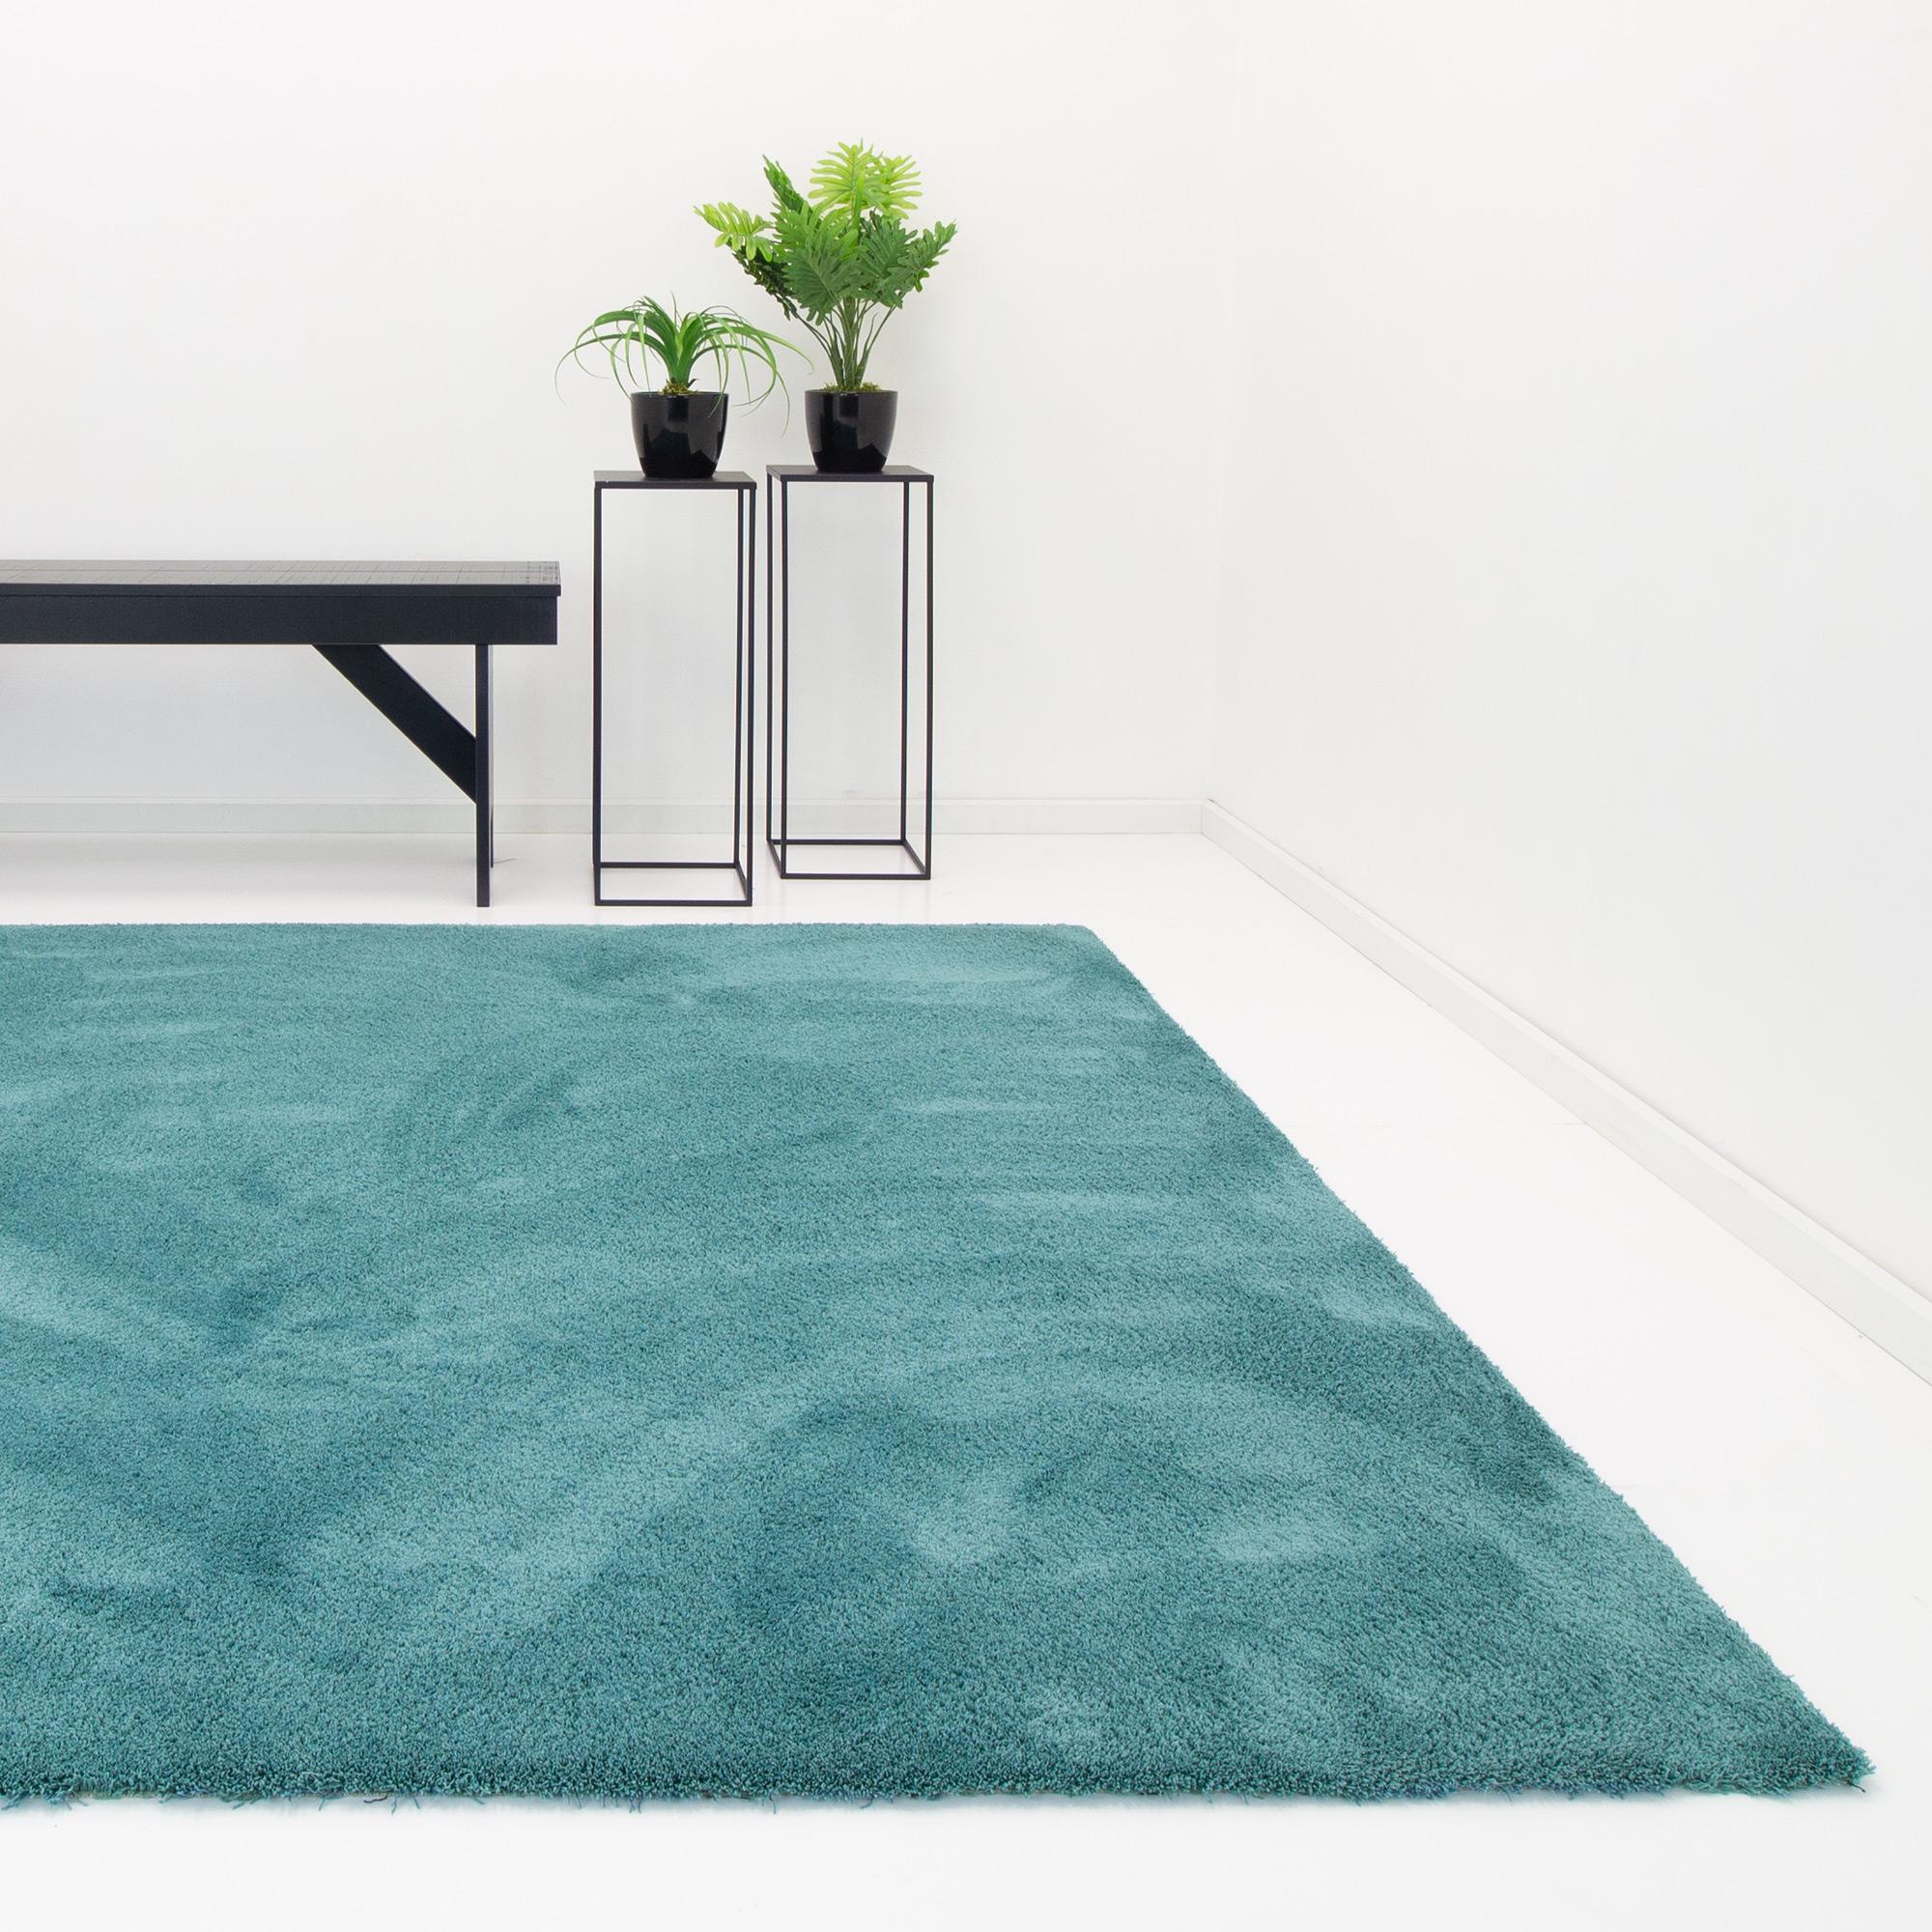 Vloerkleed Xilento Amazing Aqua | 200 x 300 cm